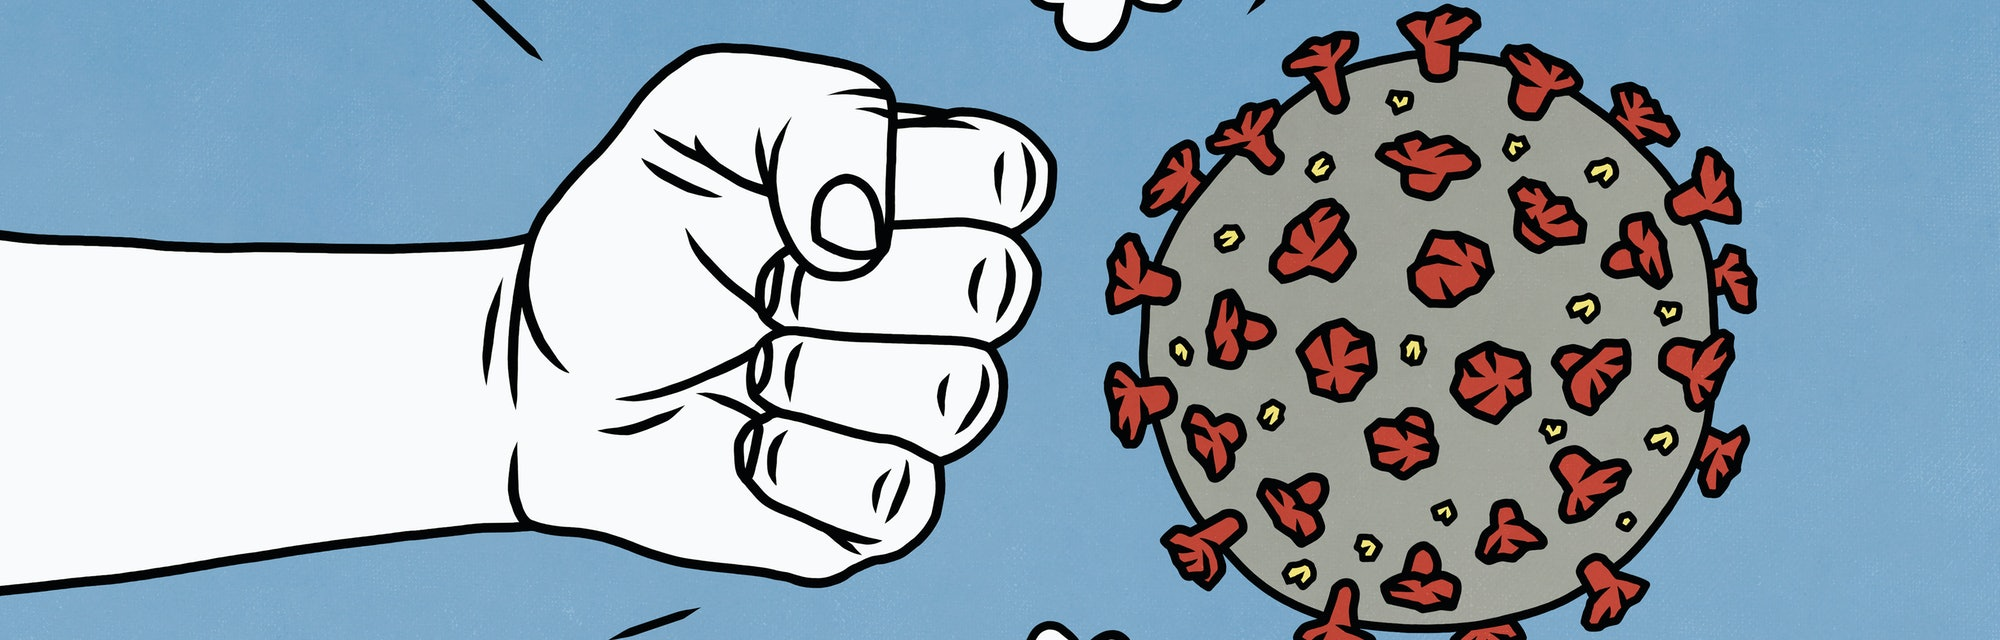 Fighting coronavirus concept illustration.